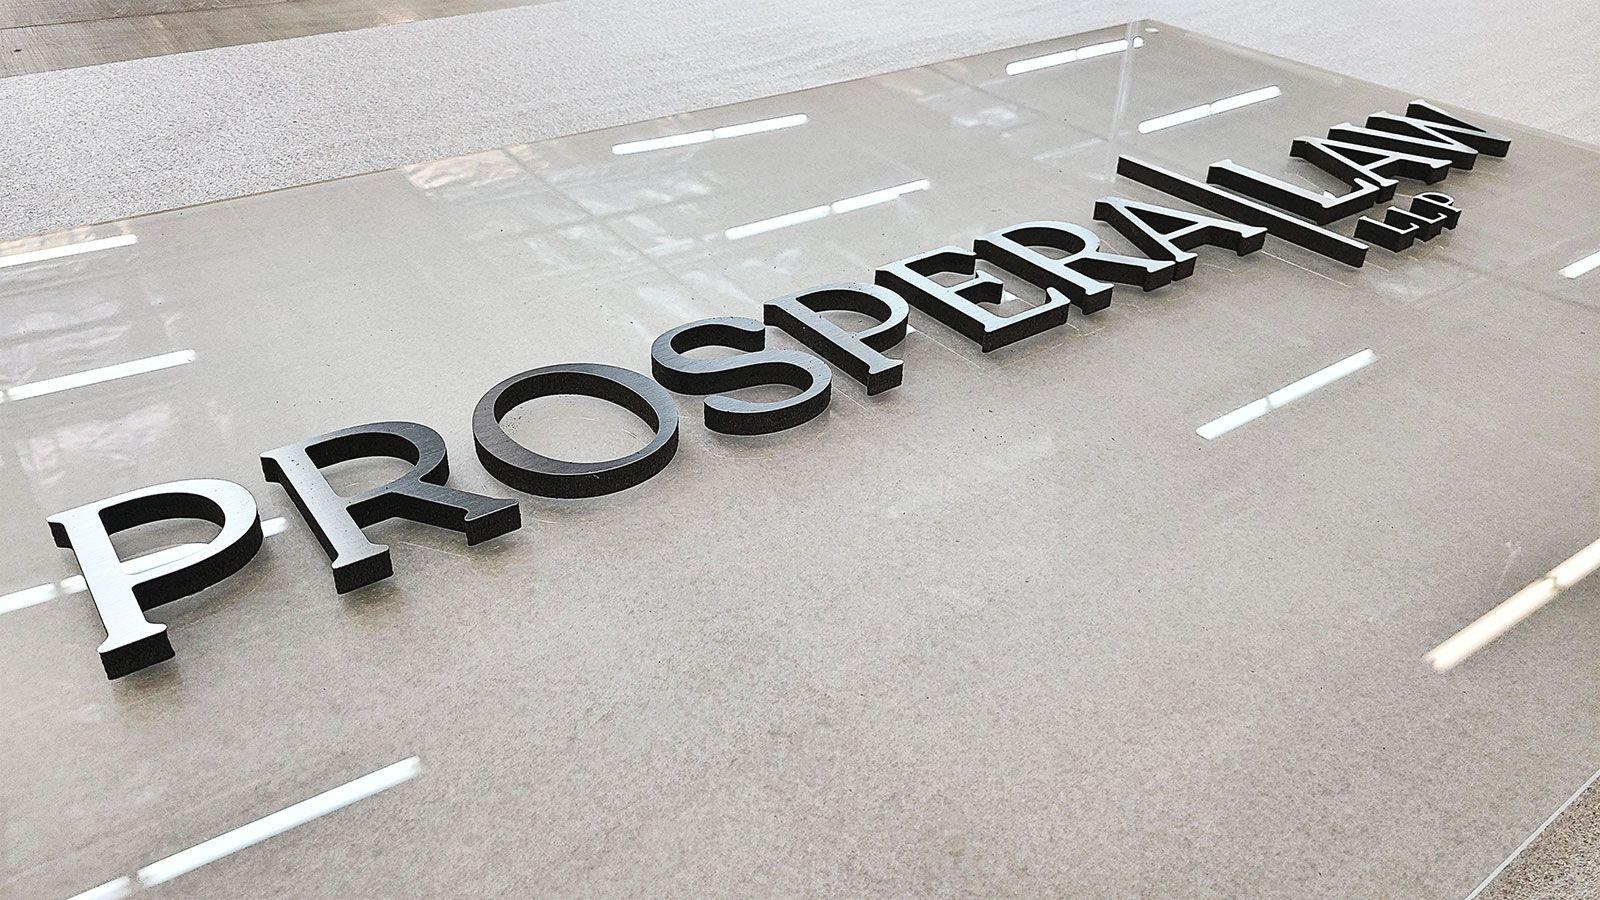 Prospera Law acrylic nameplate